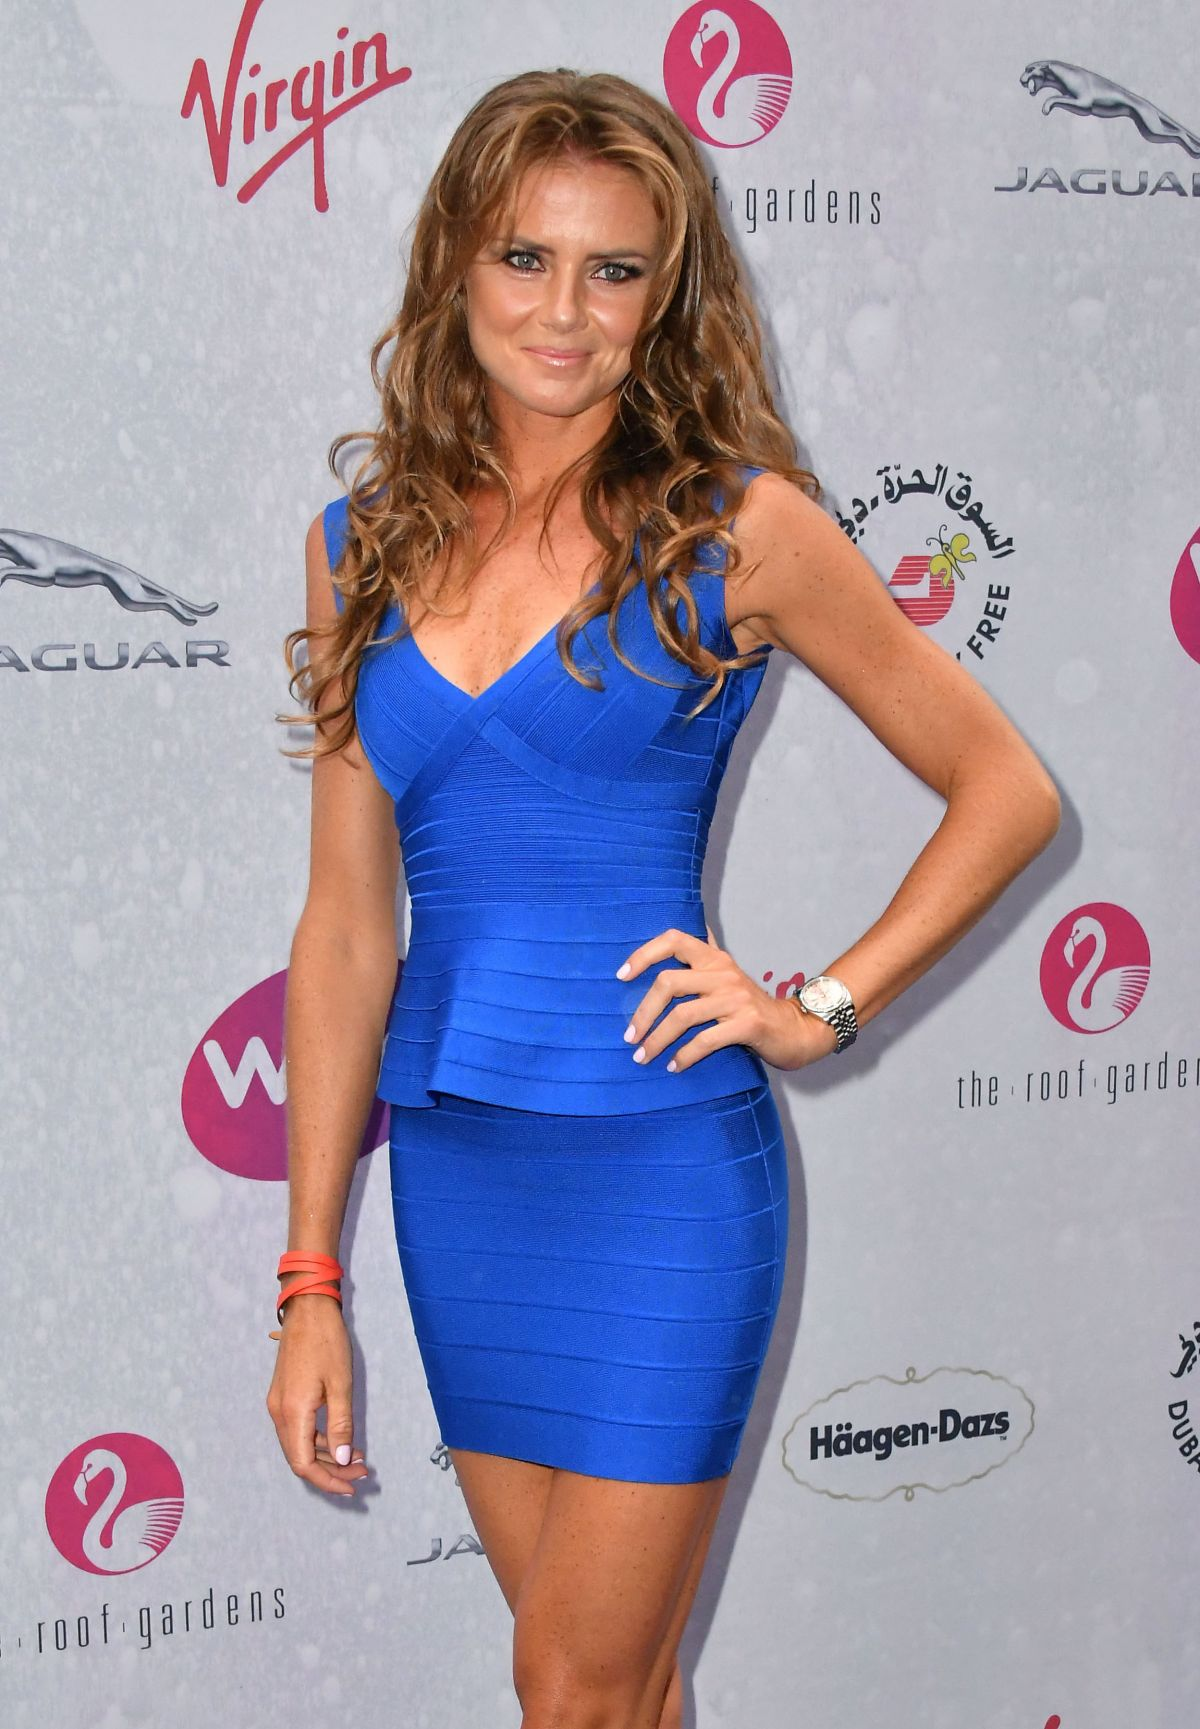 DANIELA HANTUVHOVA at WTA Pre-Wimbledon Party in London 06/23/2016